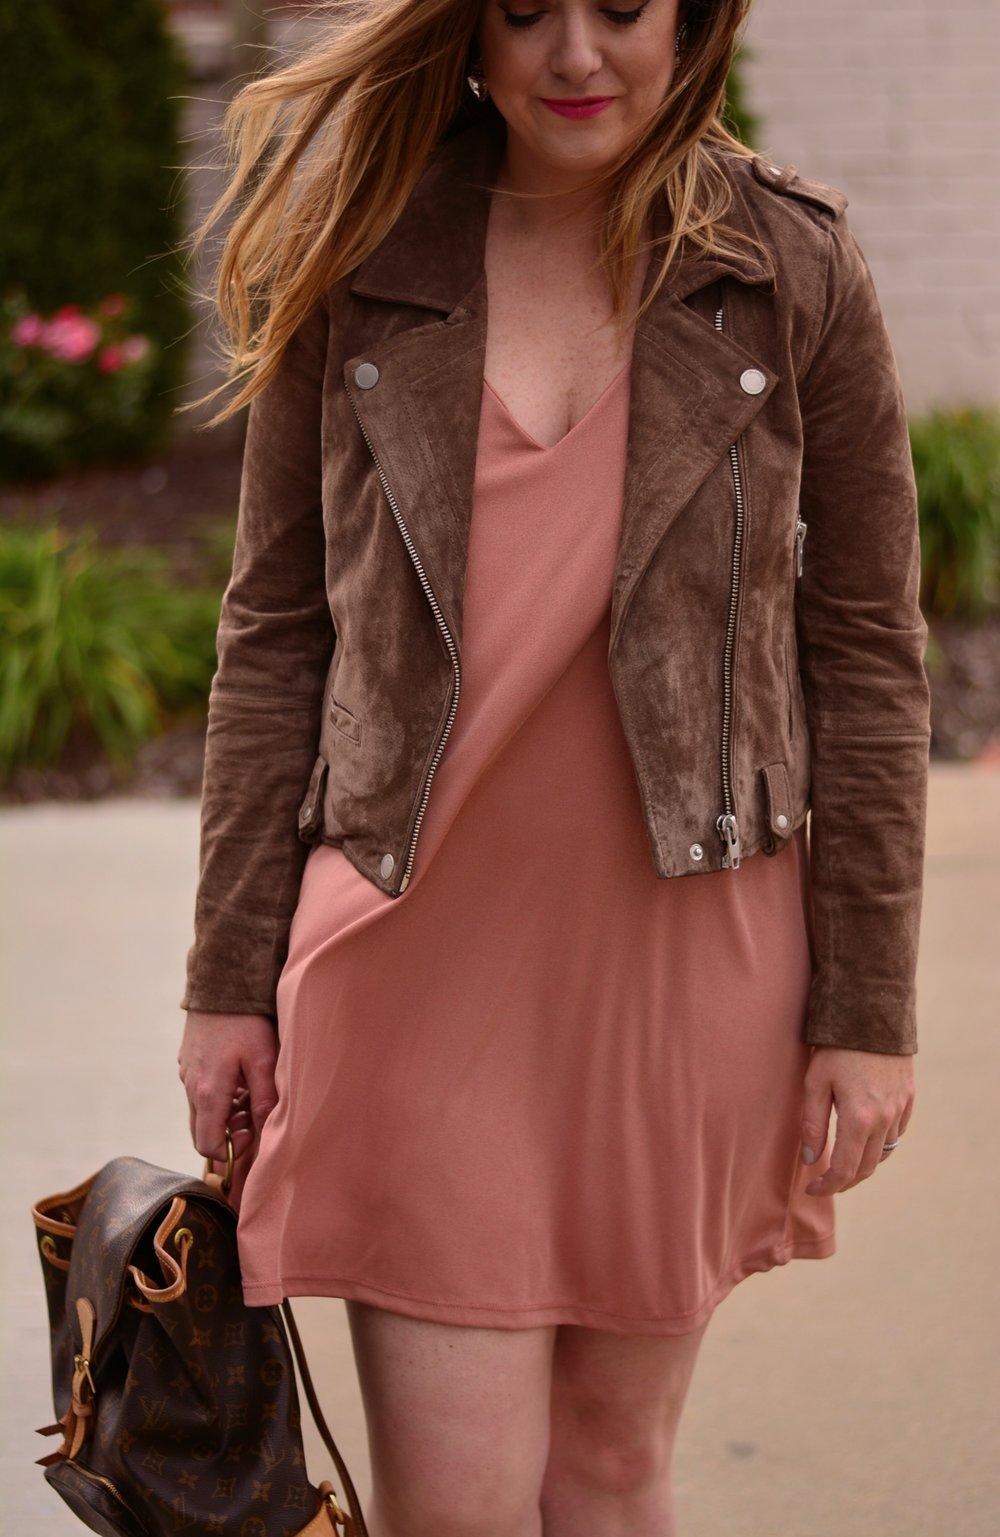 Spring blush dress